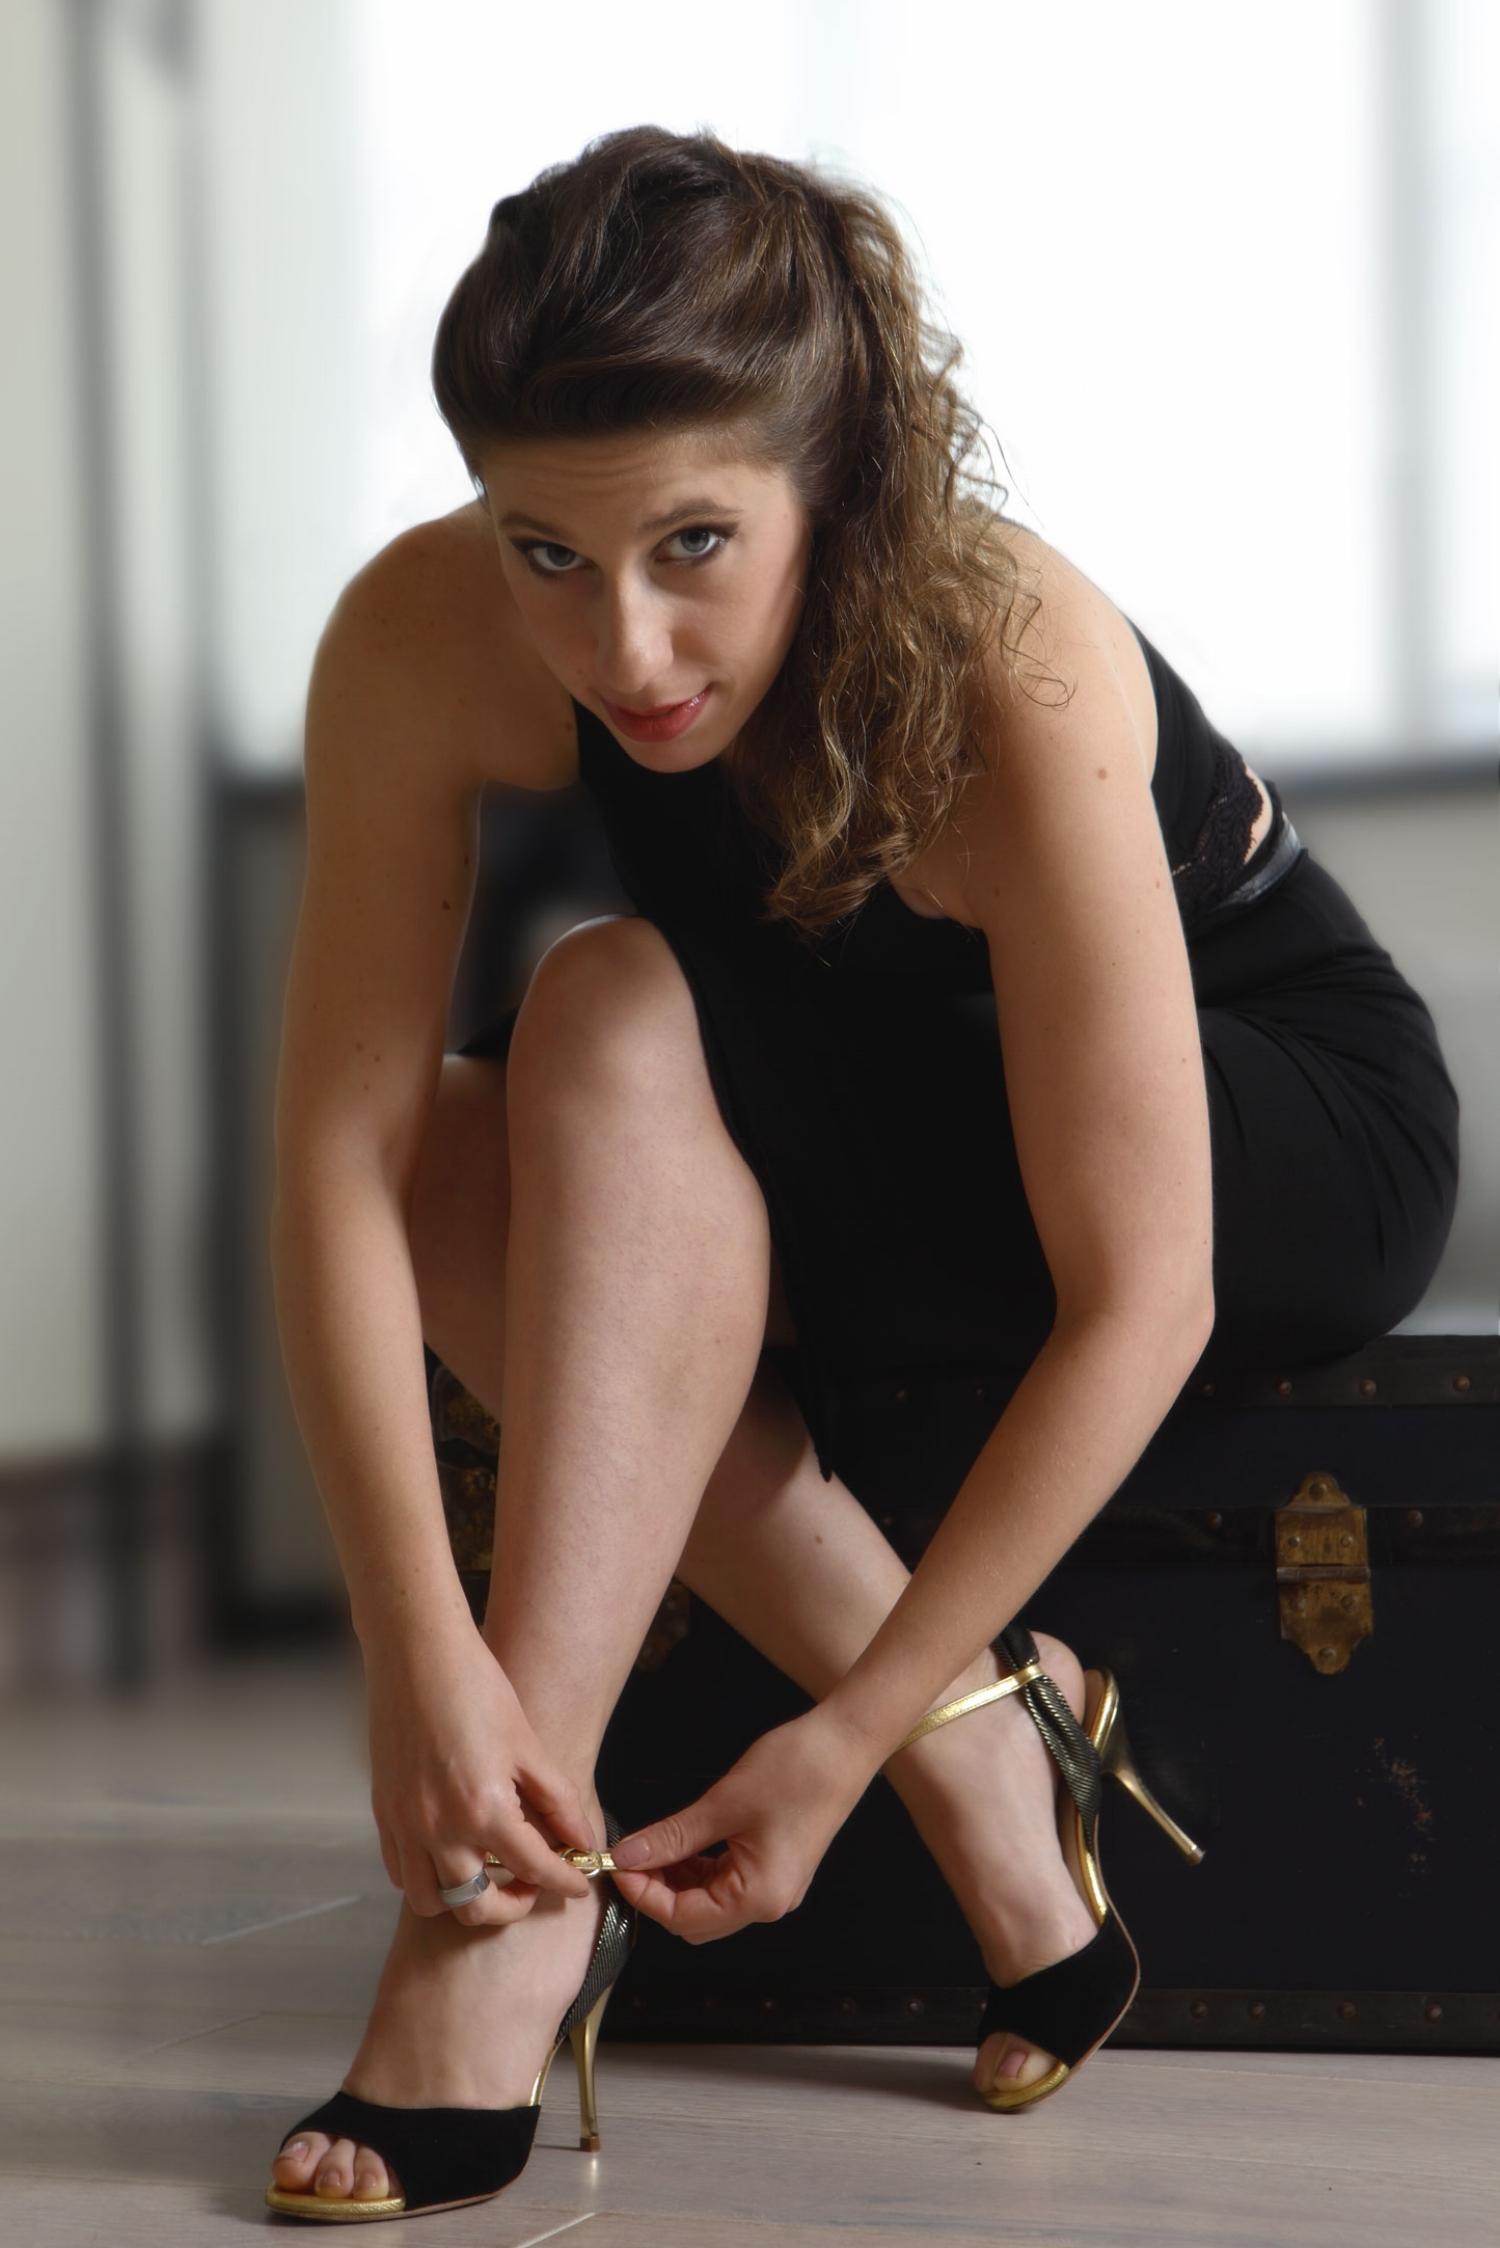 Stefania Colina putting on shoes (Al Verla Pasar) - click to shop